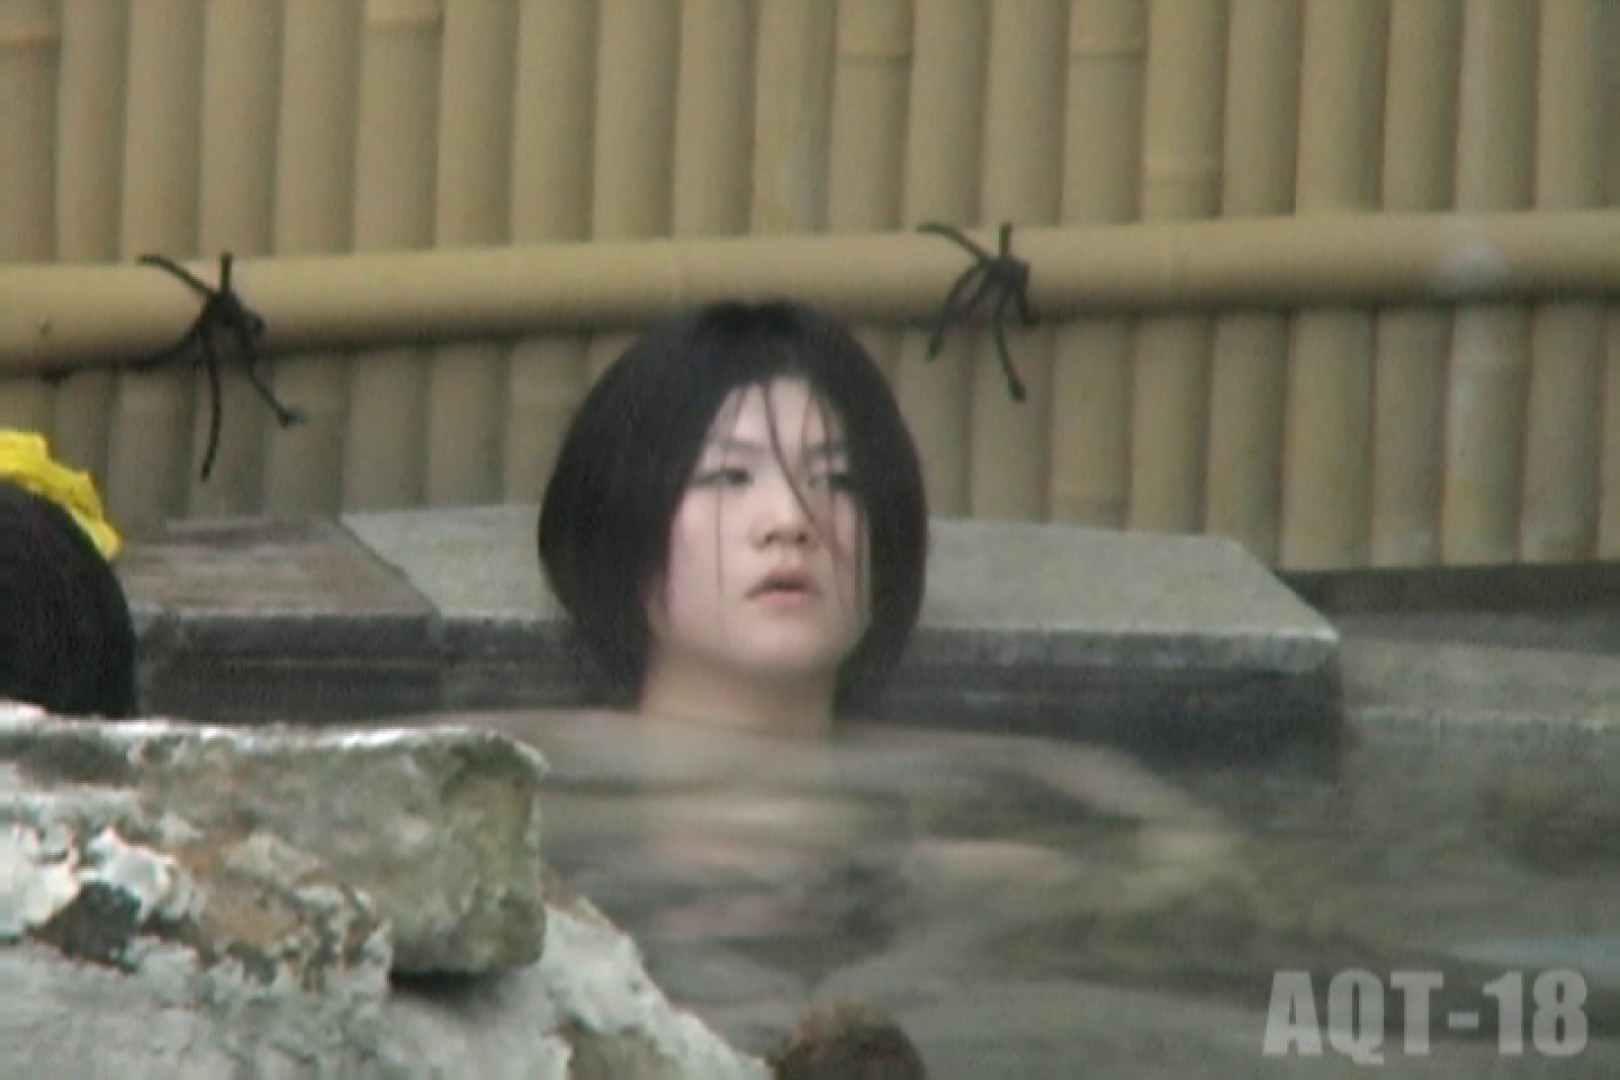 Aquaな露天風呂Vol.859 盗撮 戯れ無修正画像 76連発 17